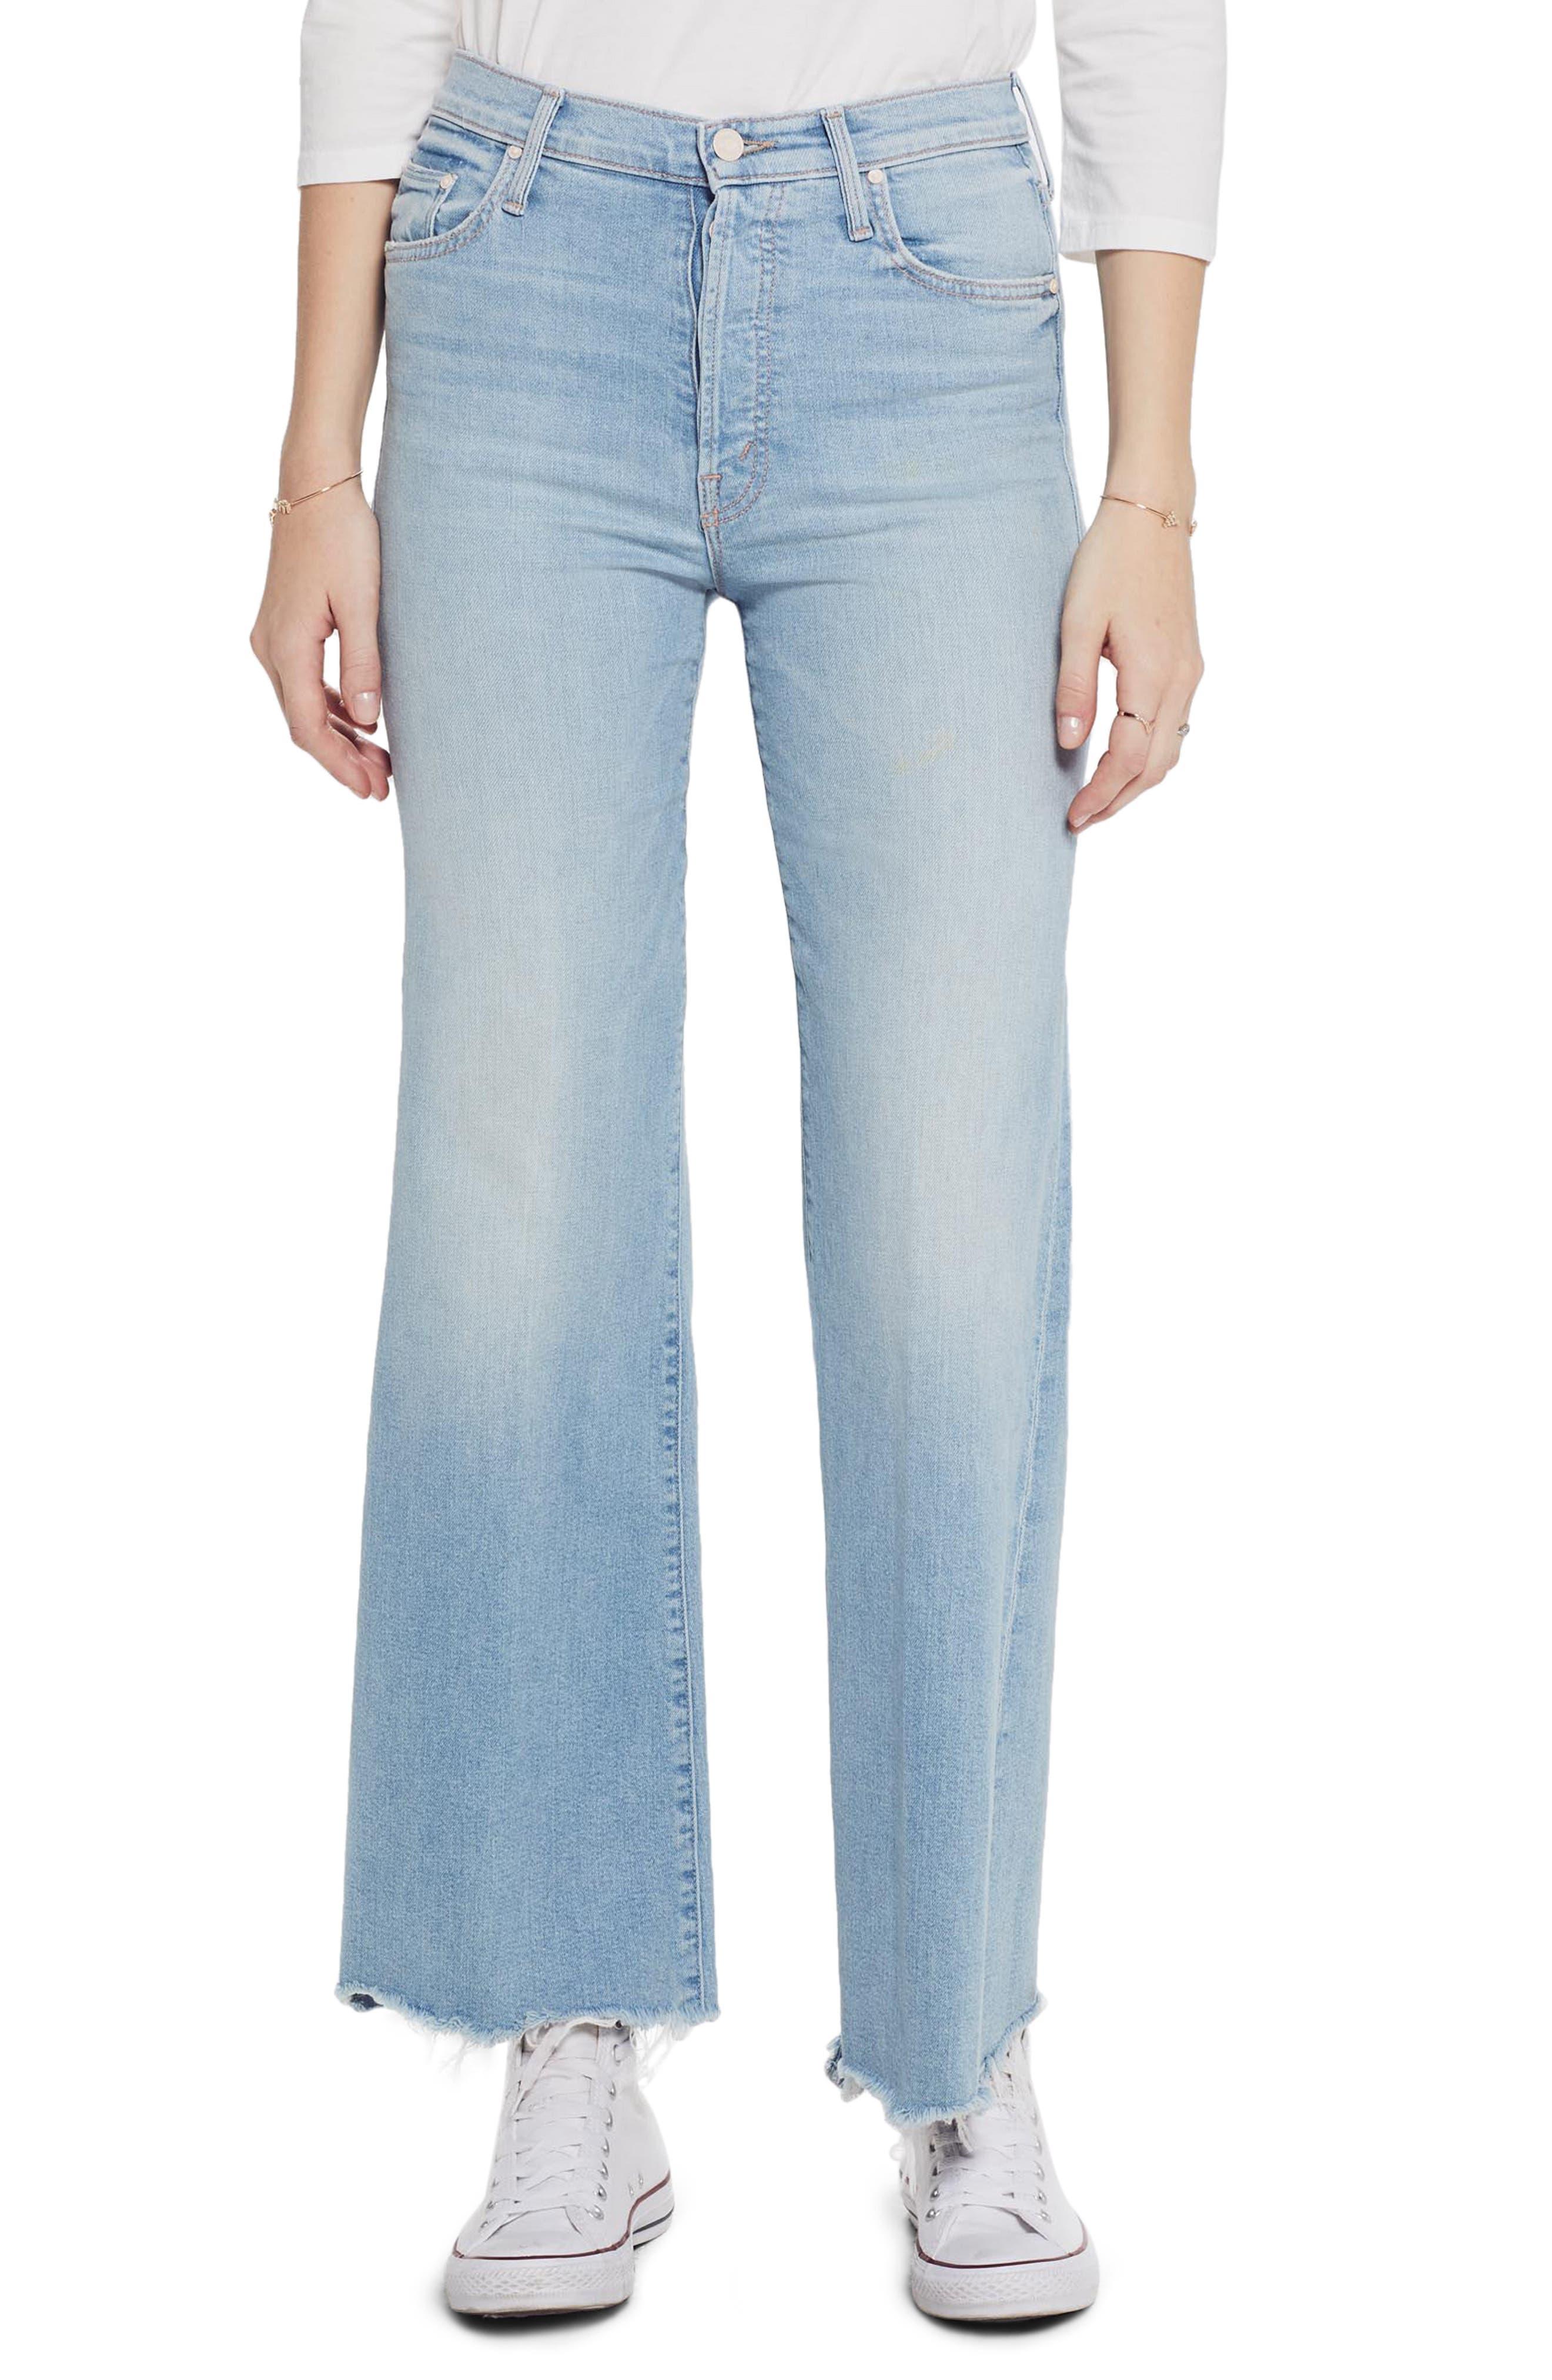 Mother Jeans The Tomcat Roller High Waist Chew Hem Jeans